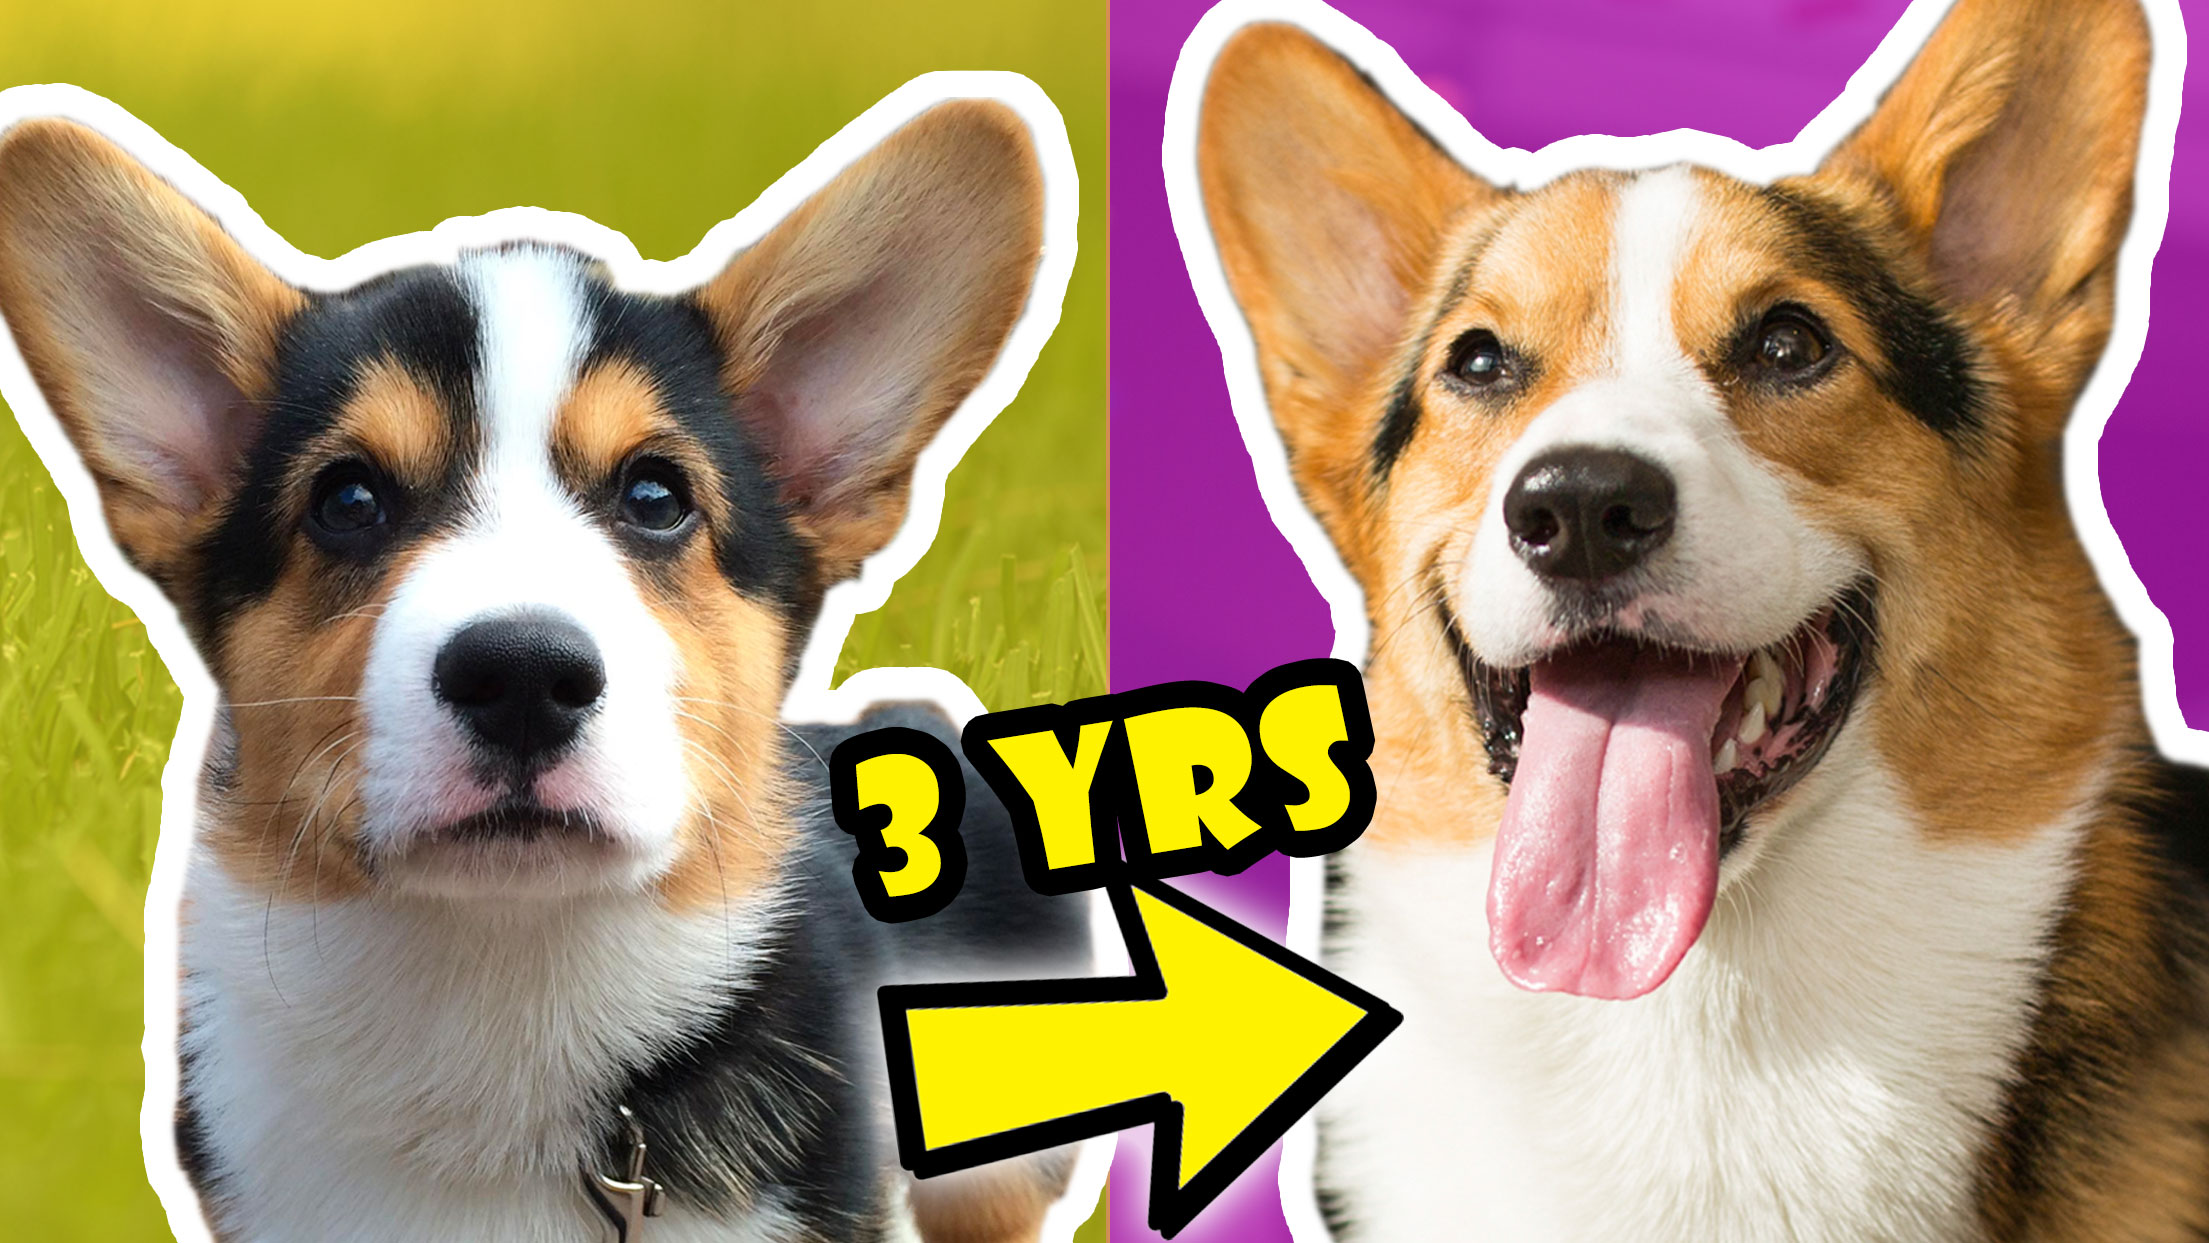 CORGI PUPPY Vs ADULT DOG COMPARISON Year 3